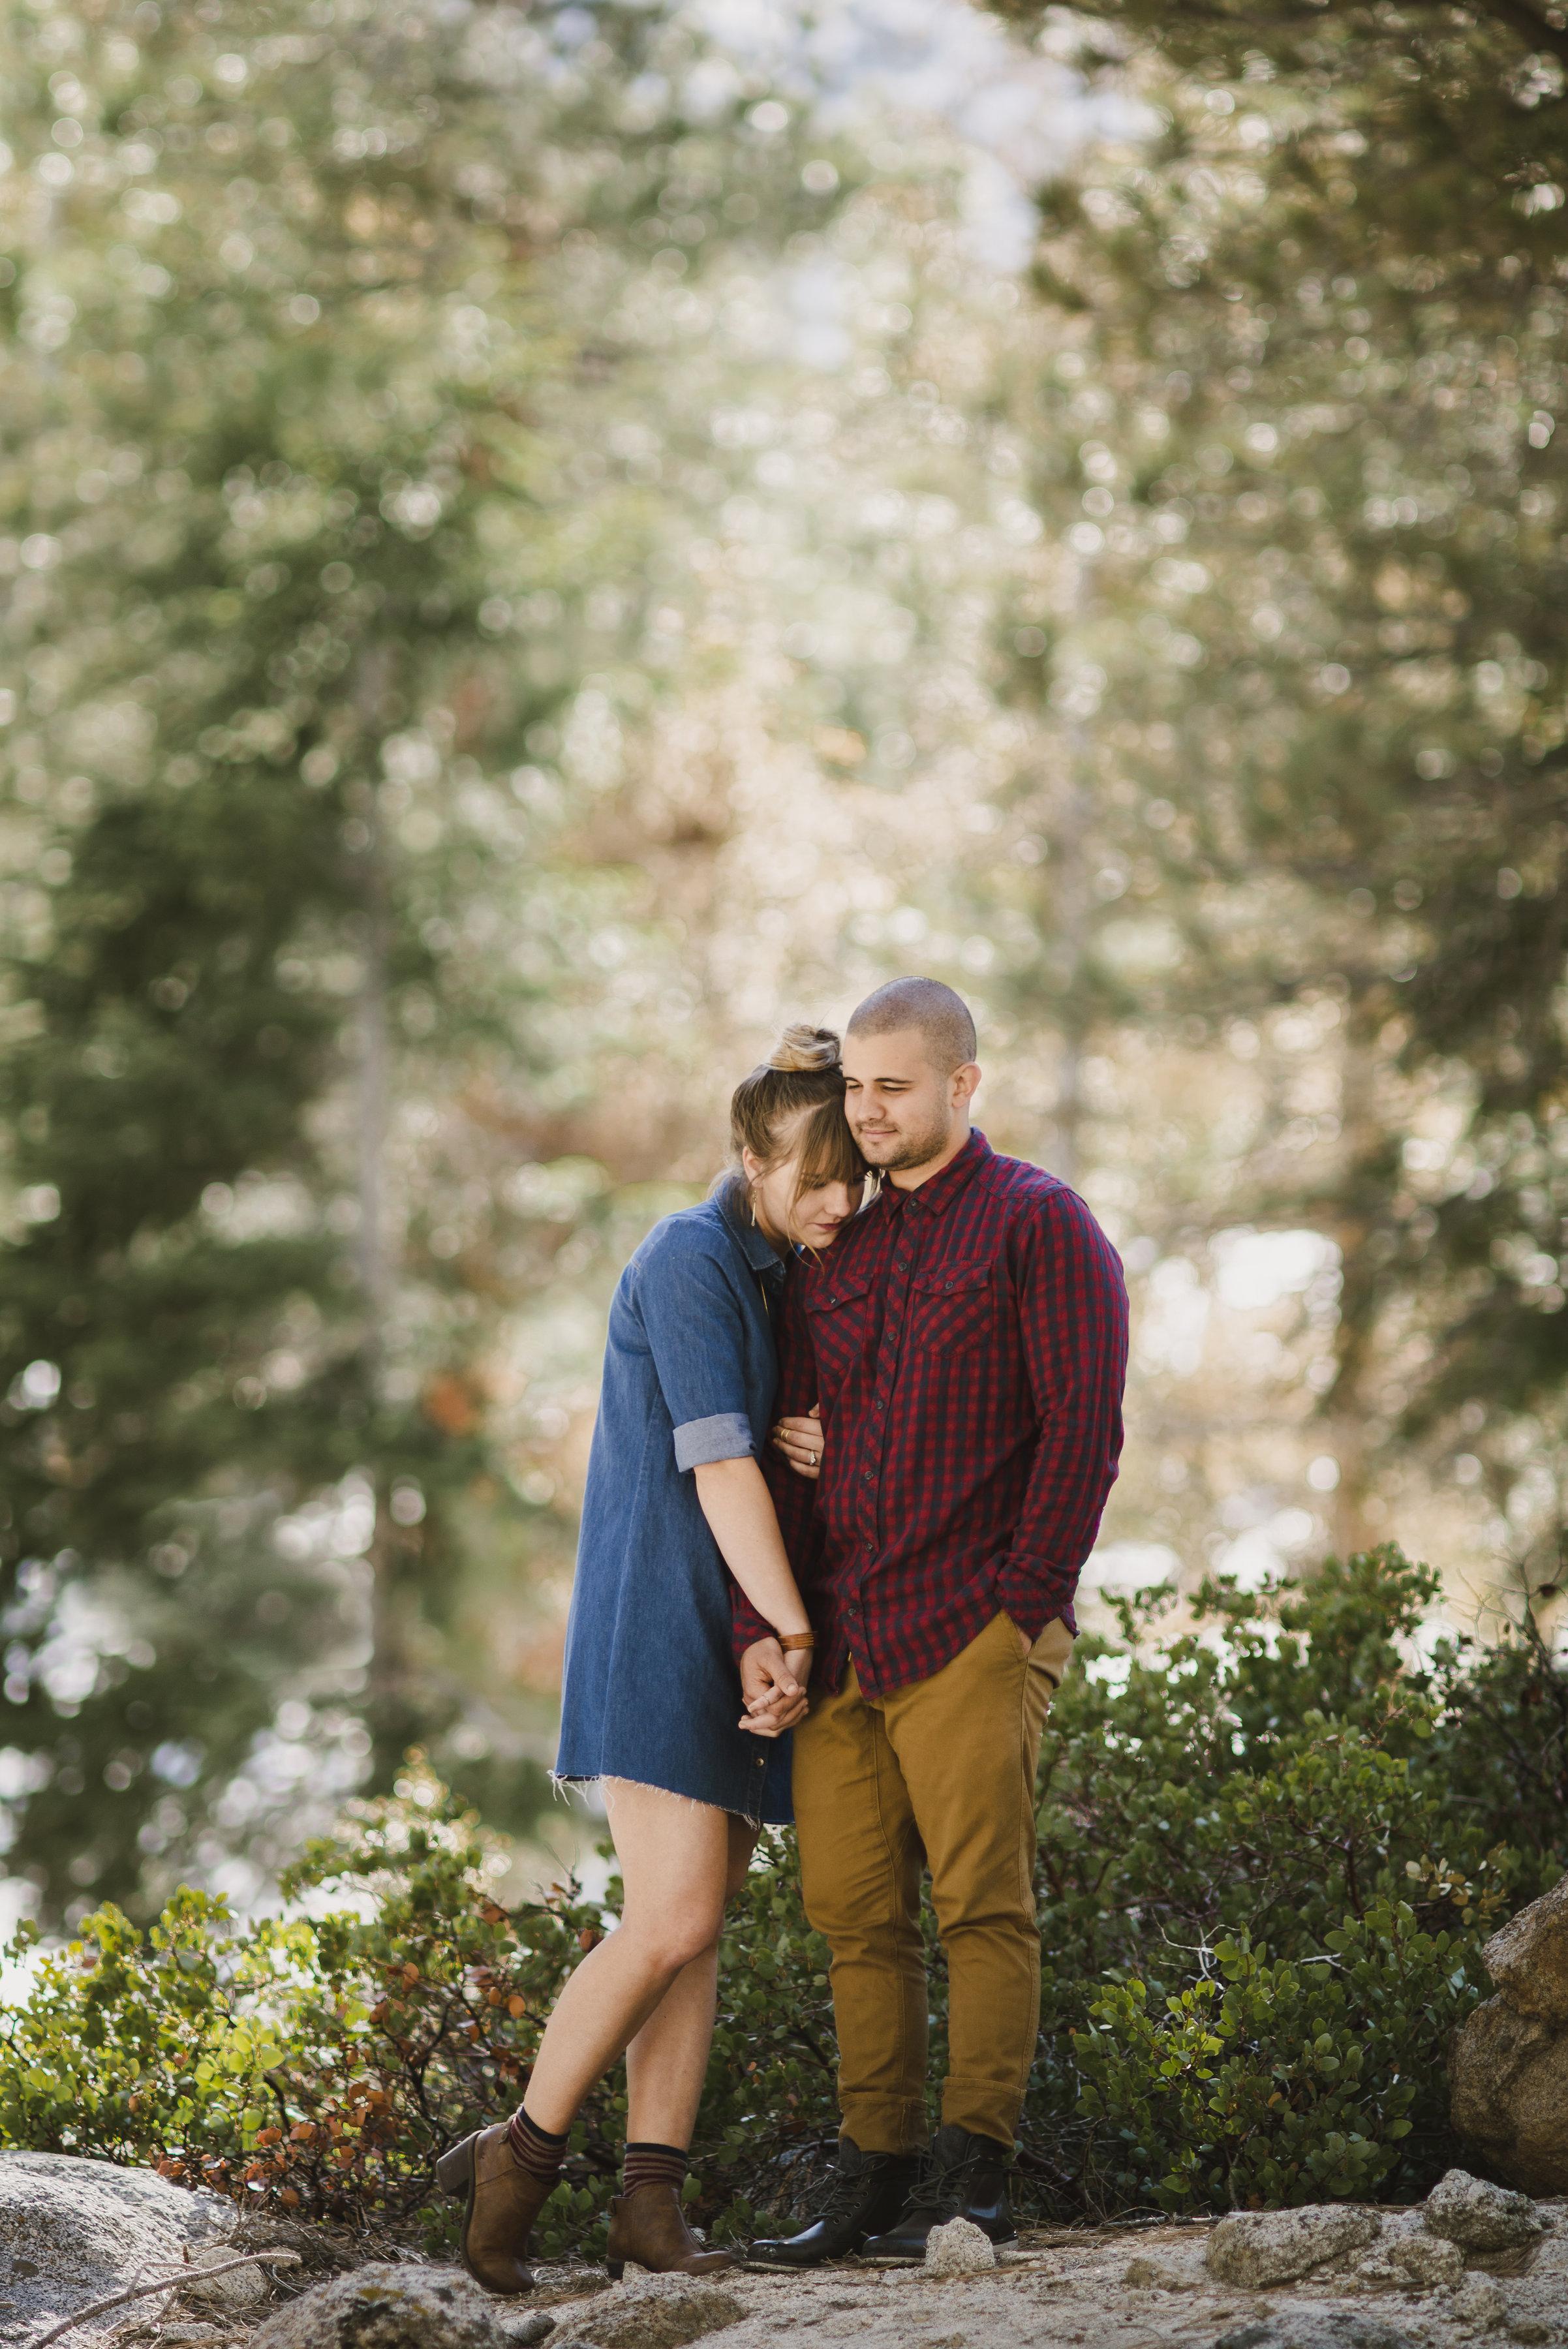 Isaiah&TaylorPhotography-Jared&KelseyEngagement-99.jpg